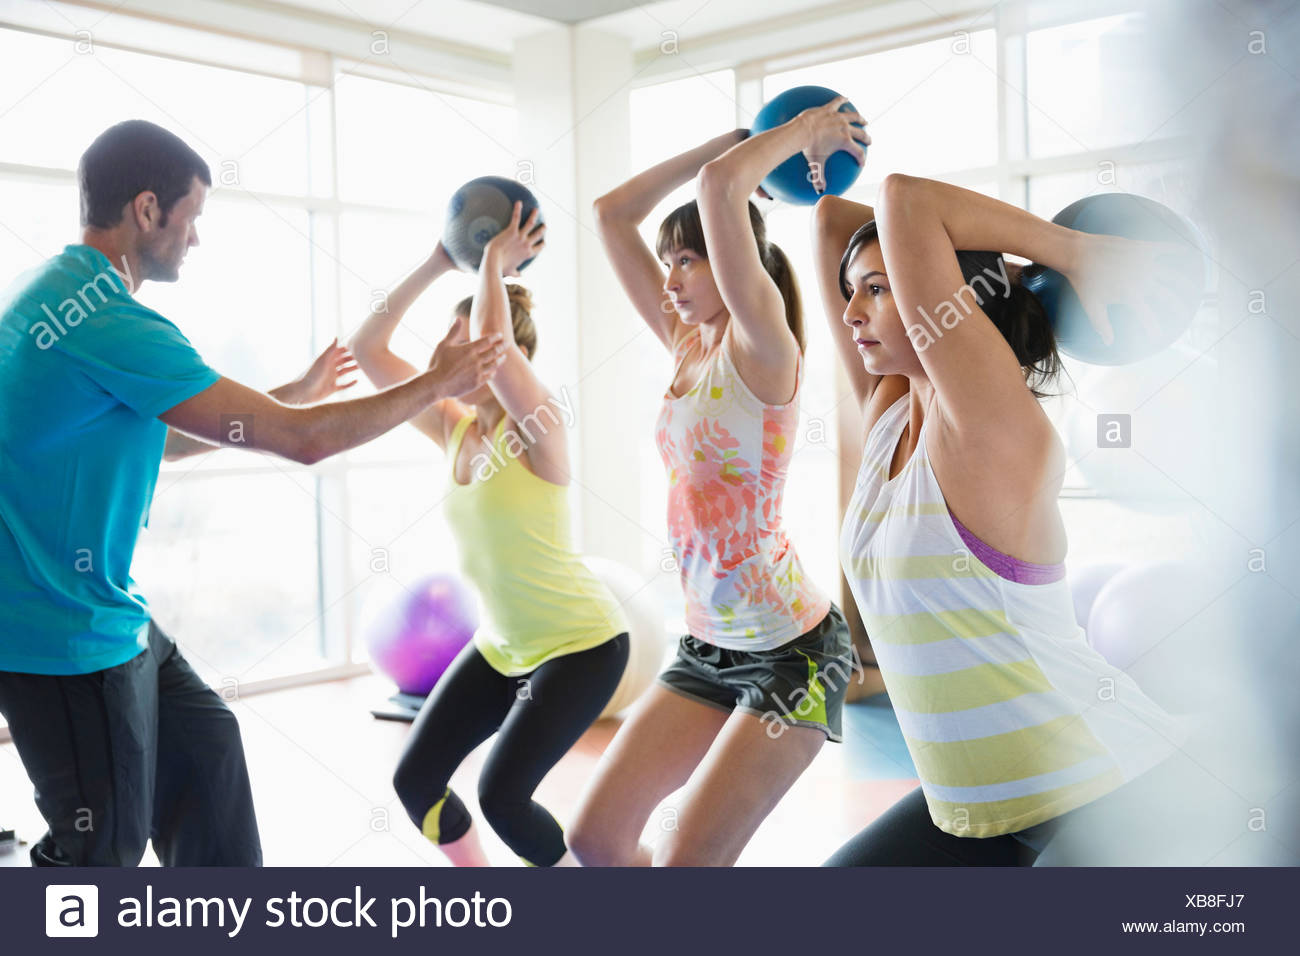 Women using medicine balls in fitness class - Stock Image